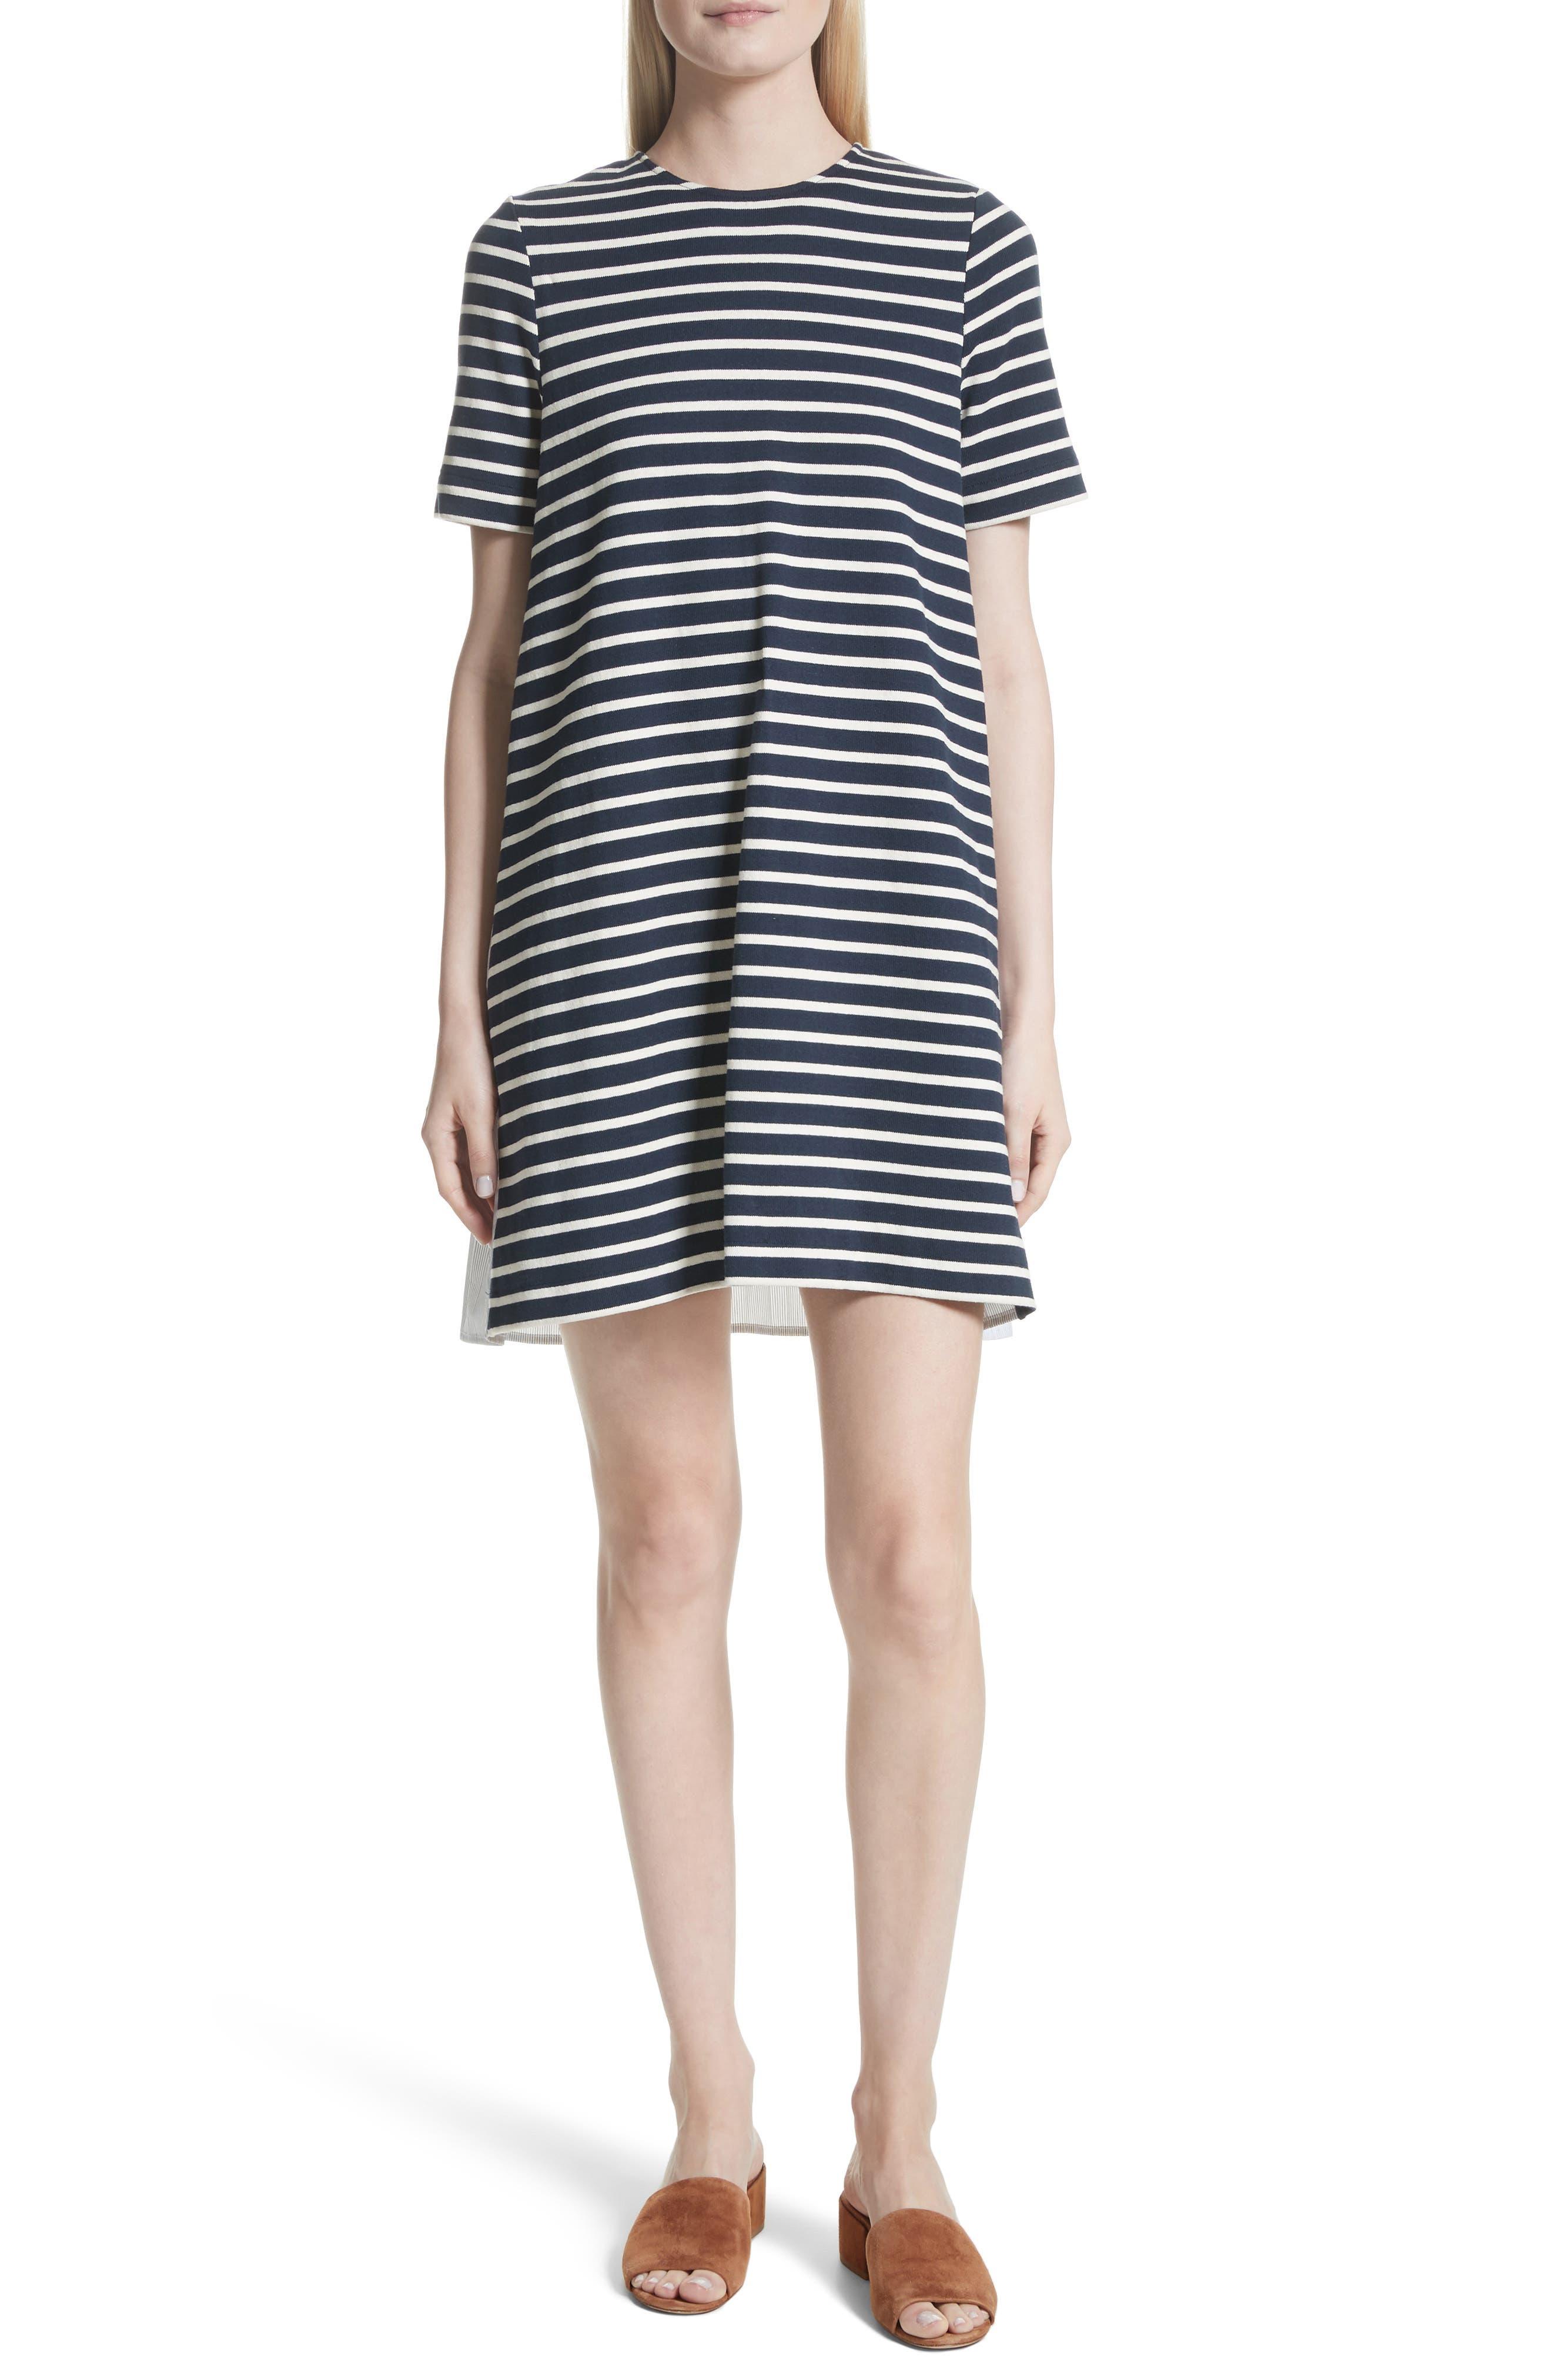 Latch Back Tunic Dress,                             Main thumbnail 1, color,                             Navy/ Cream Multi